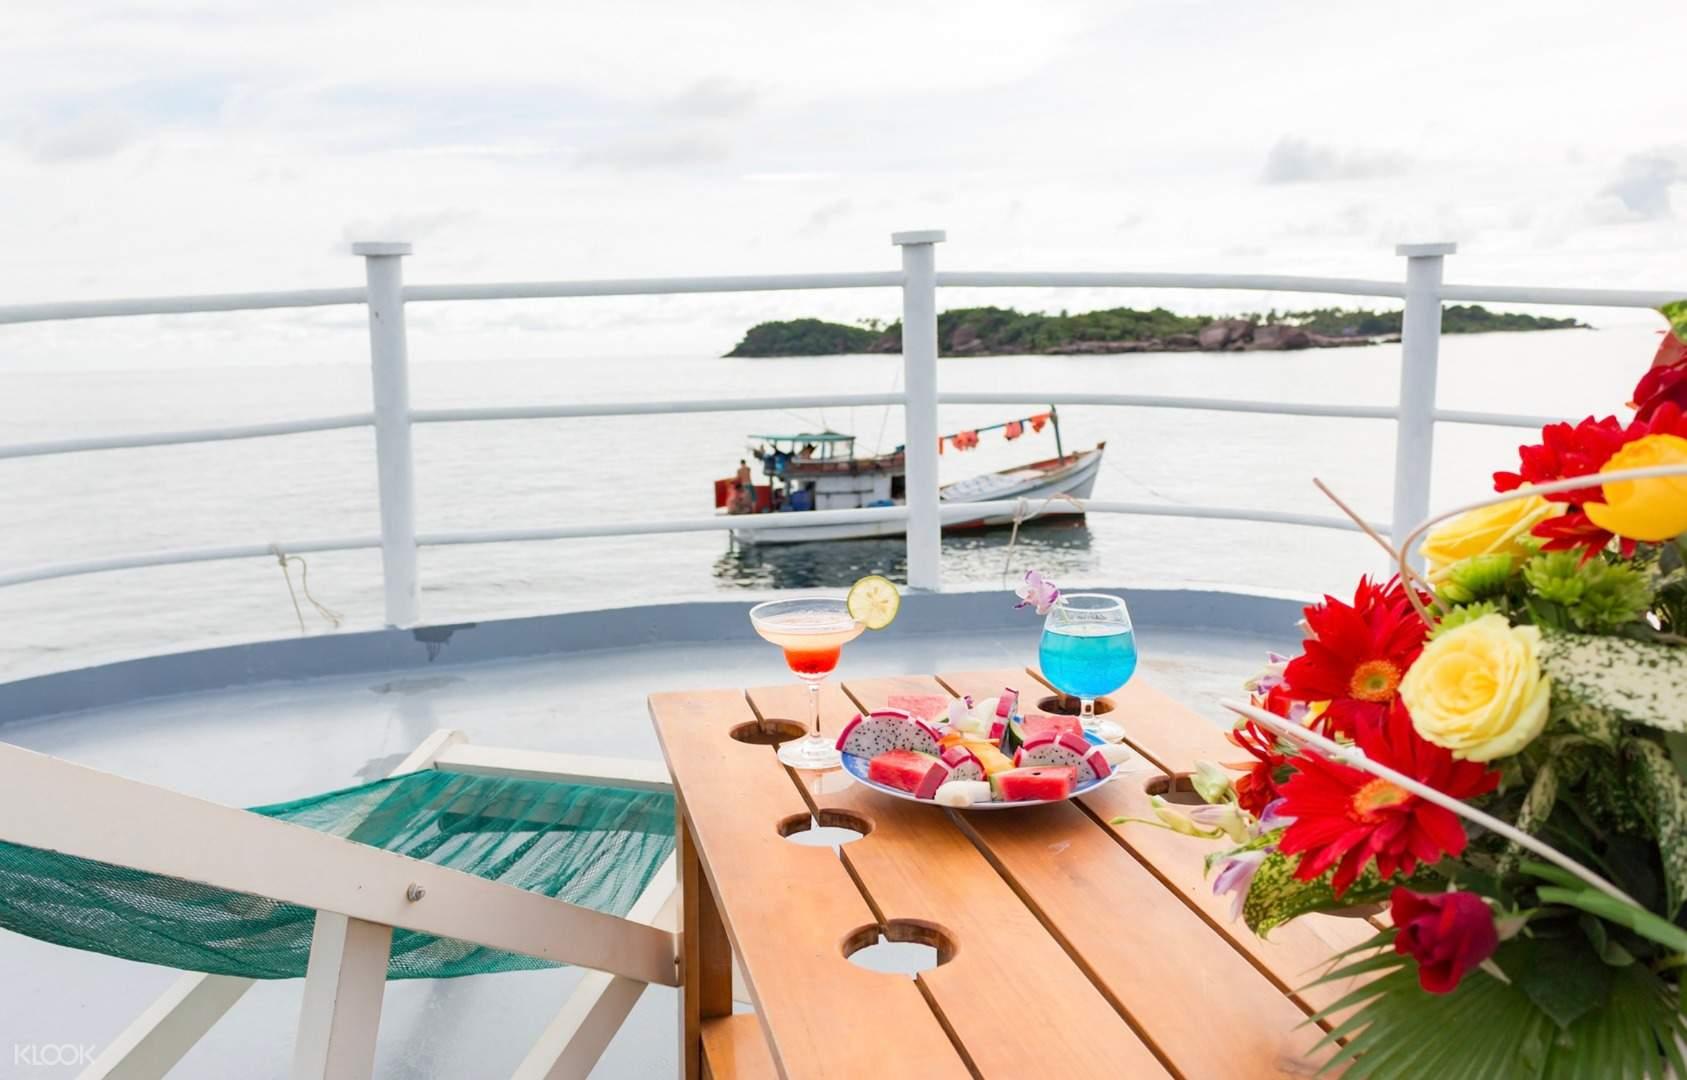 Up to 25% Off | 2D1N Fingernail Island, Dam Ngang Island & May Rut Island  Camping Tour, Phu Quoc, Vietnam - Klook Singapore